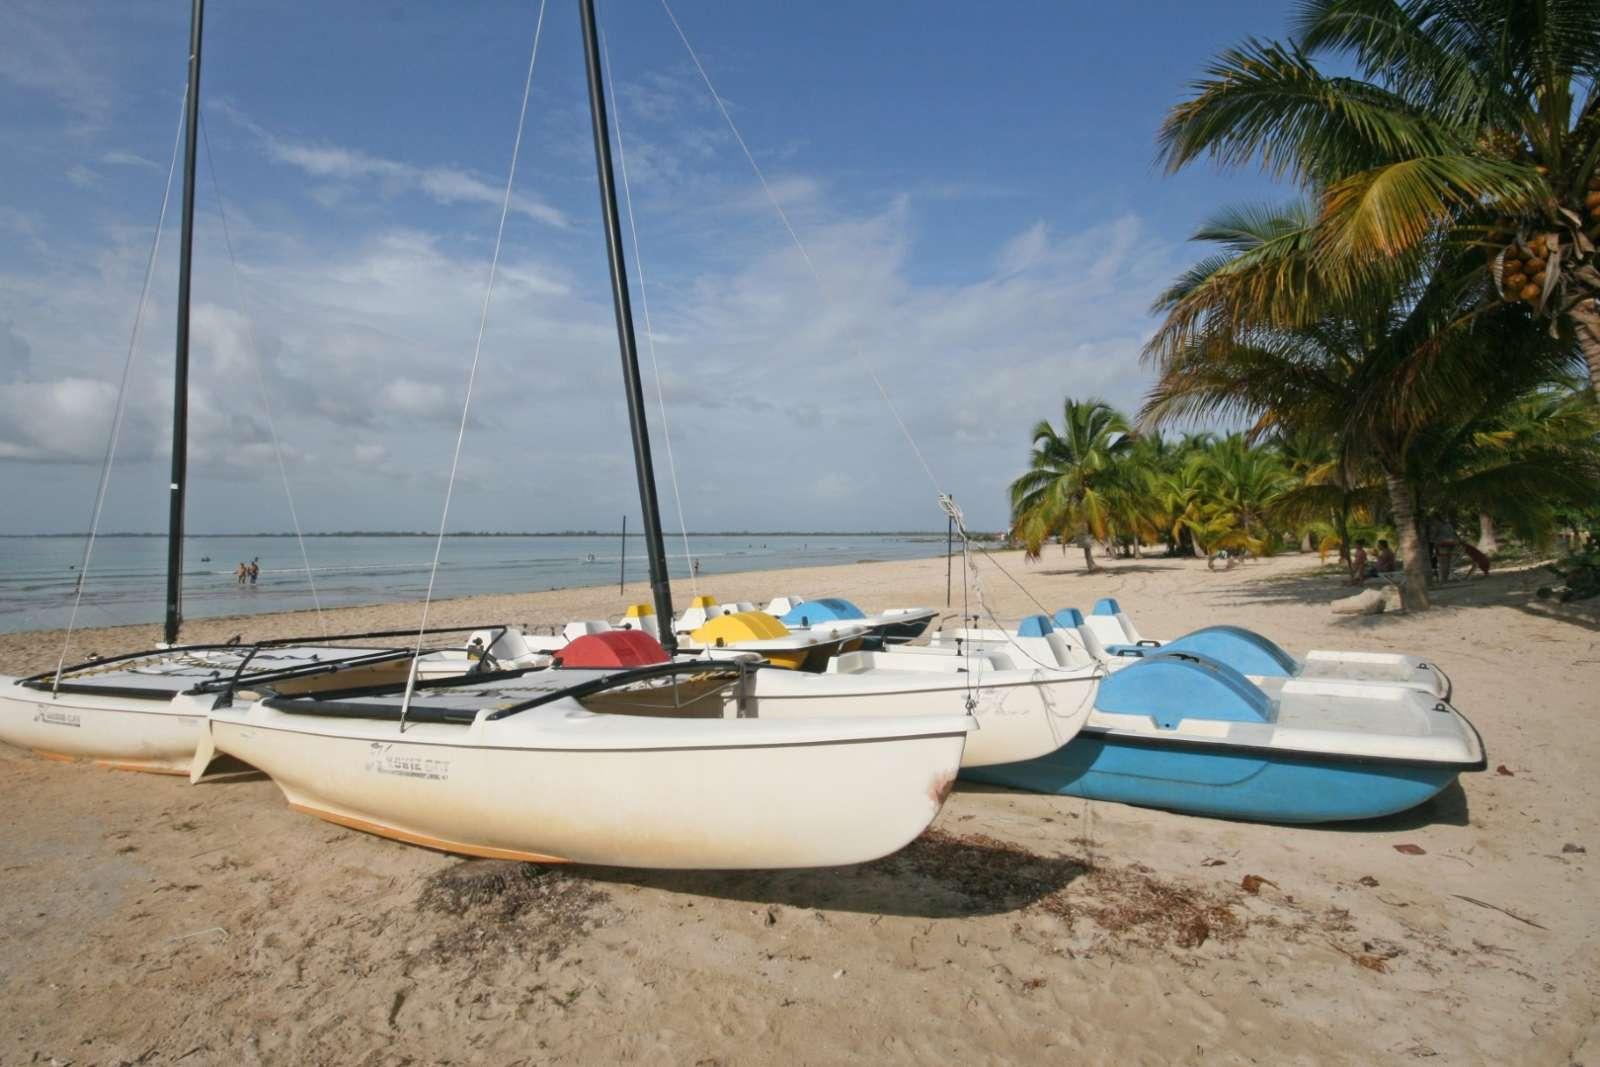 Watersports at Hotel Playa Larga